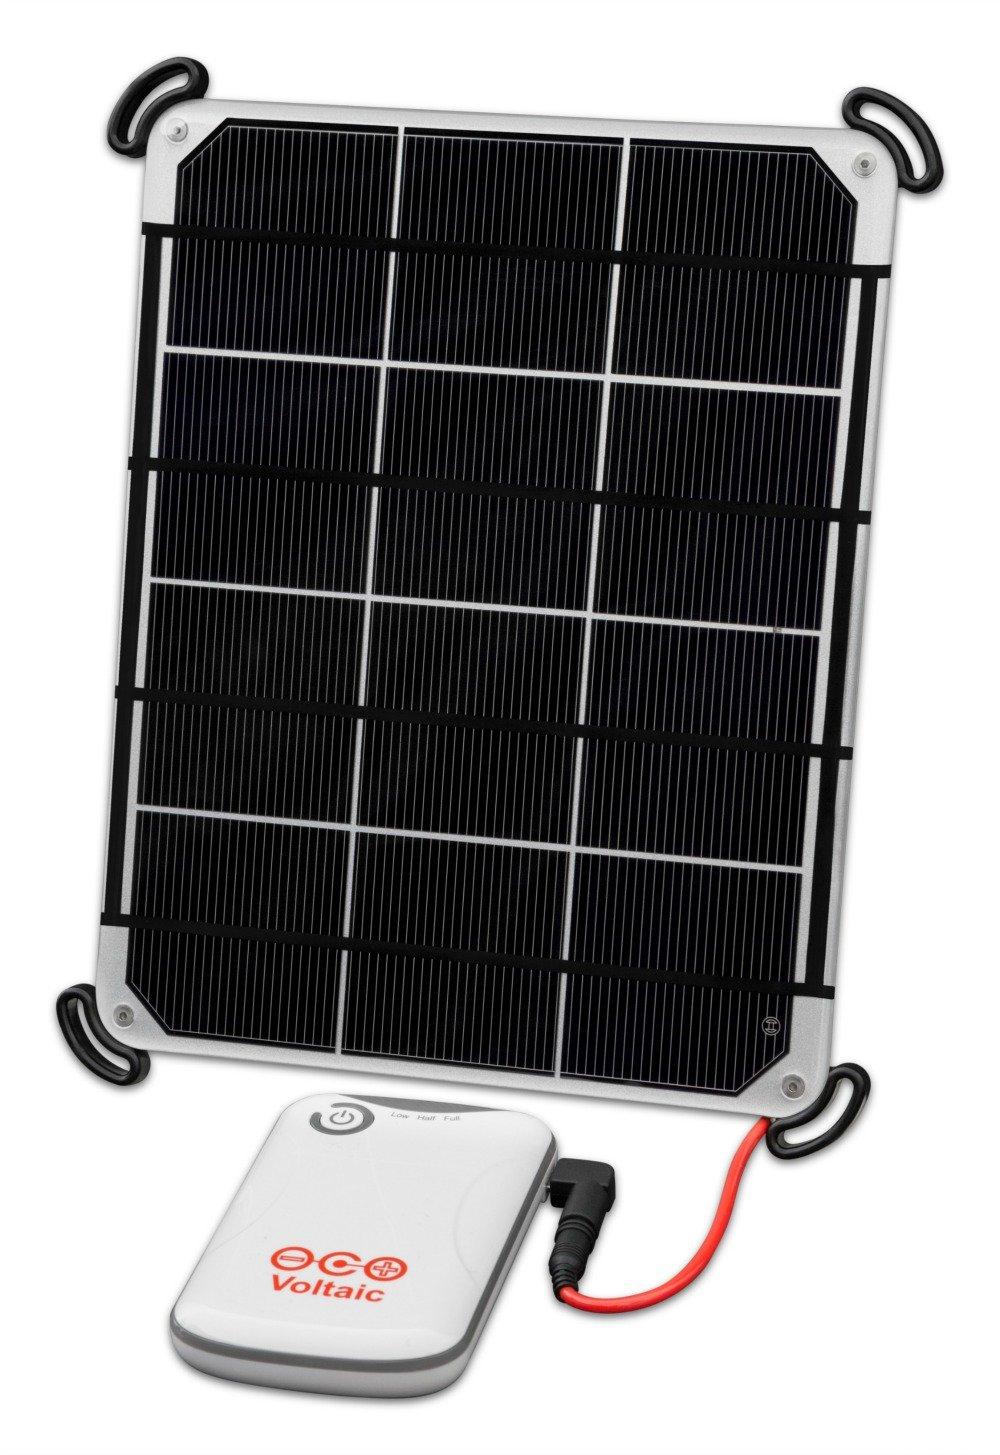 Cargador Solar Portatil con Bateria de 4000mah VOLTAIC Plate